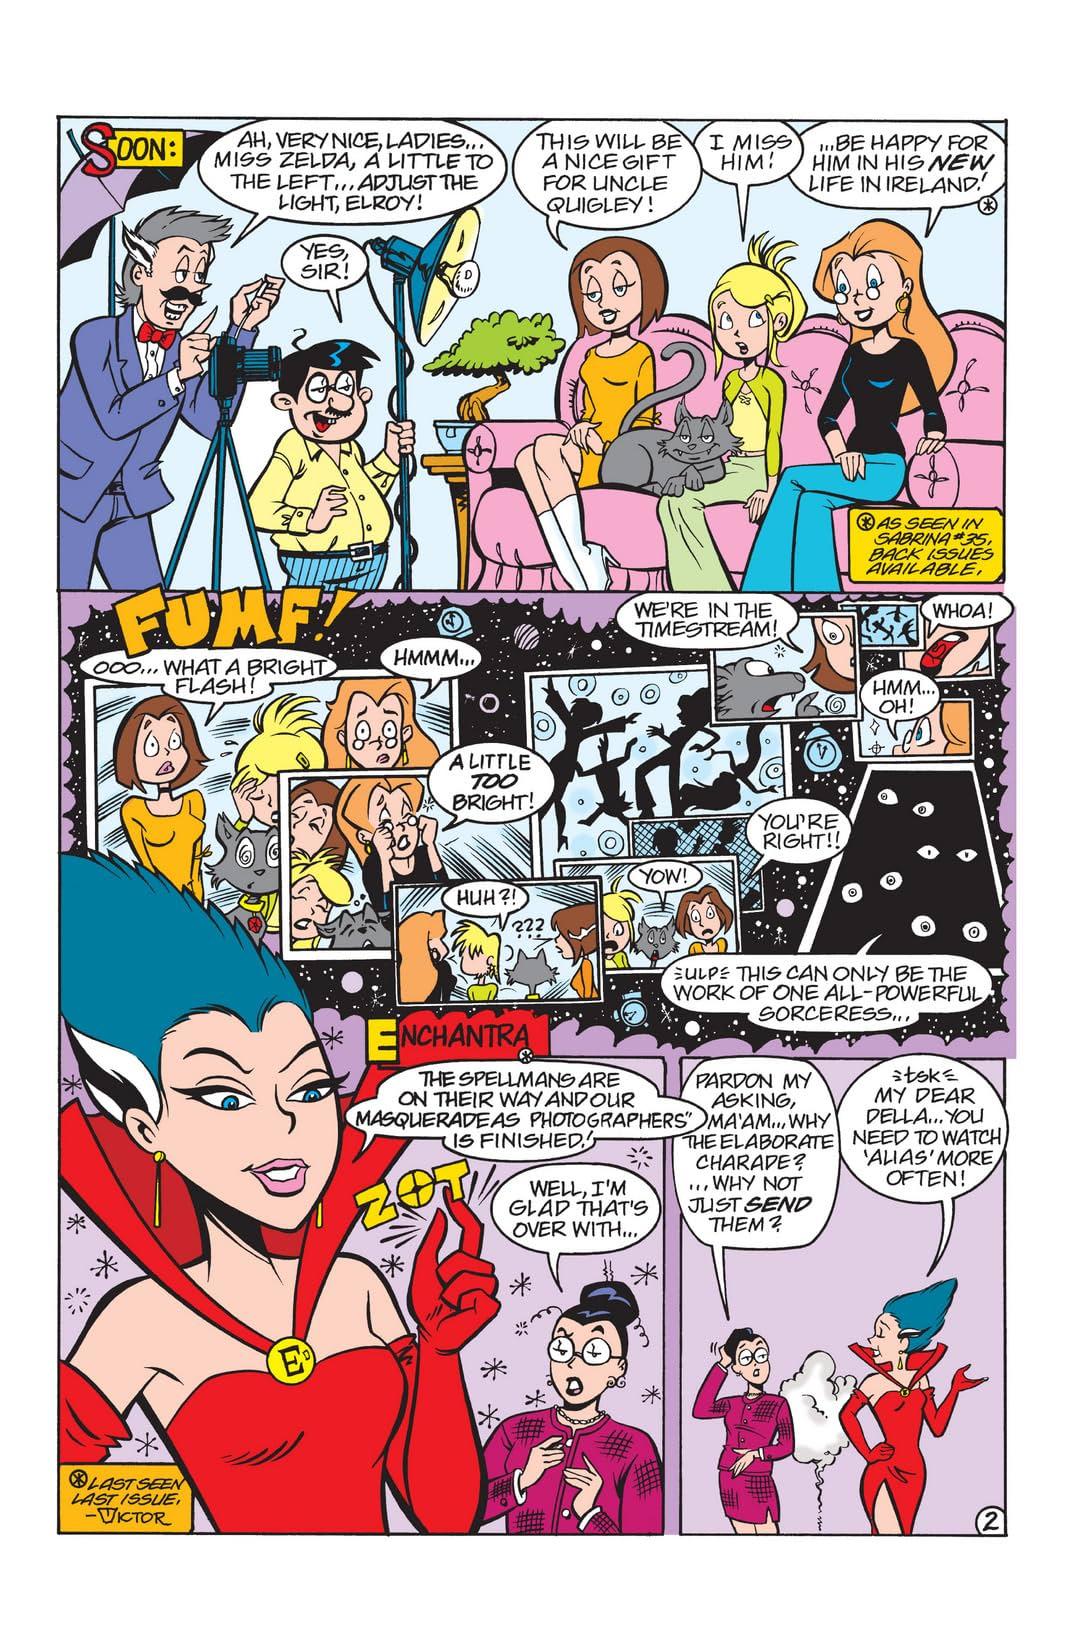 Sabrina the Teenage Witch #38